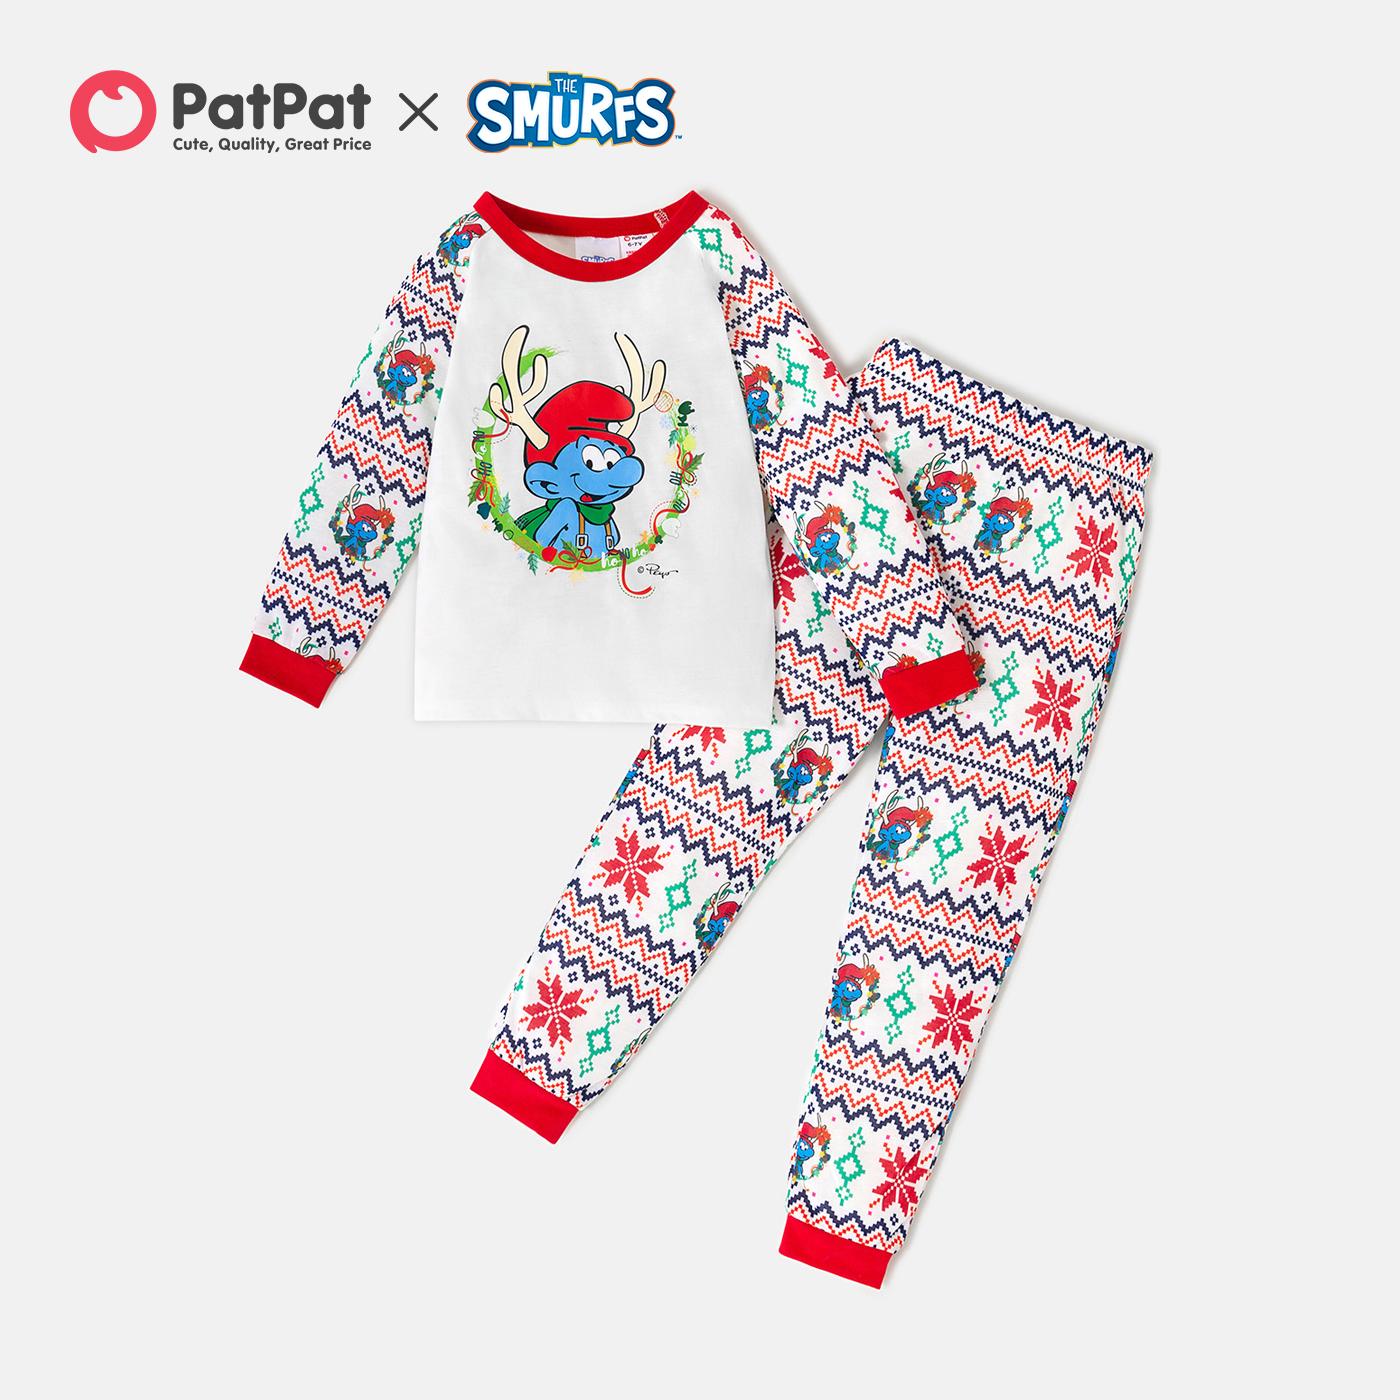 Smurfs 2-piece Kid Boy/Kid Girl Graphic Top and Allover Pants Christmas Pajamas Set(Flame Resistant)